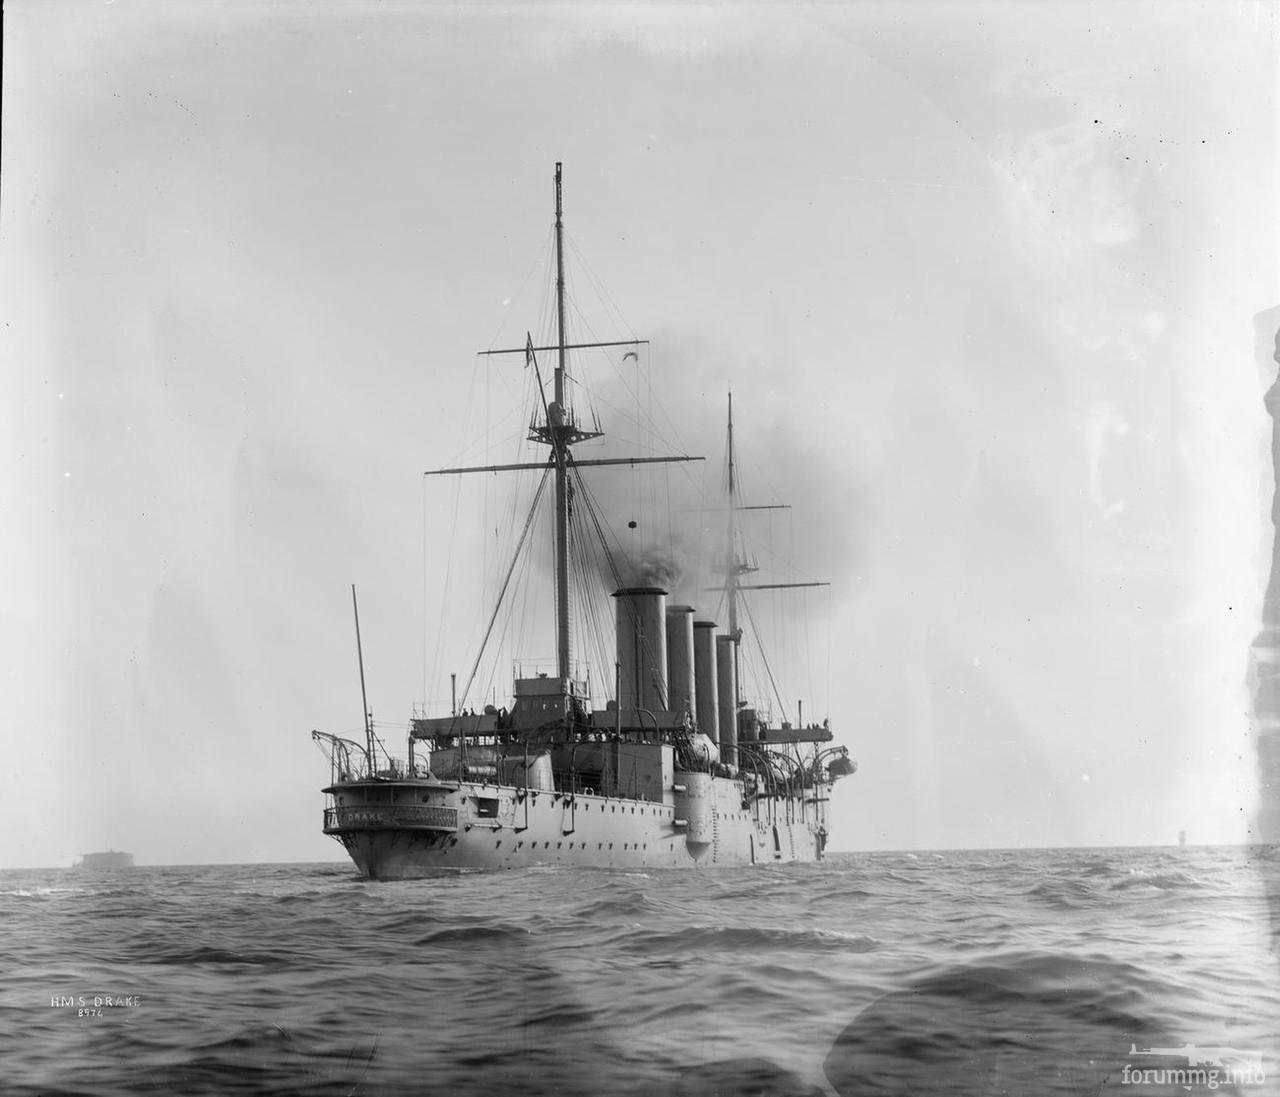 139409 - Броненосный крейсер HMS Drake